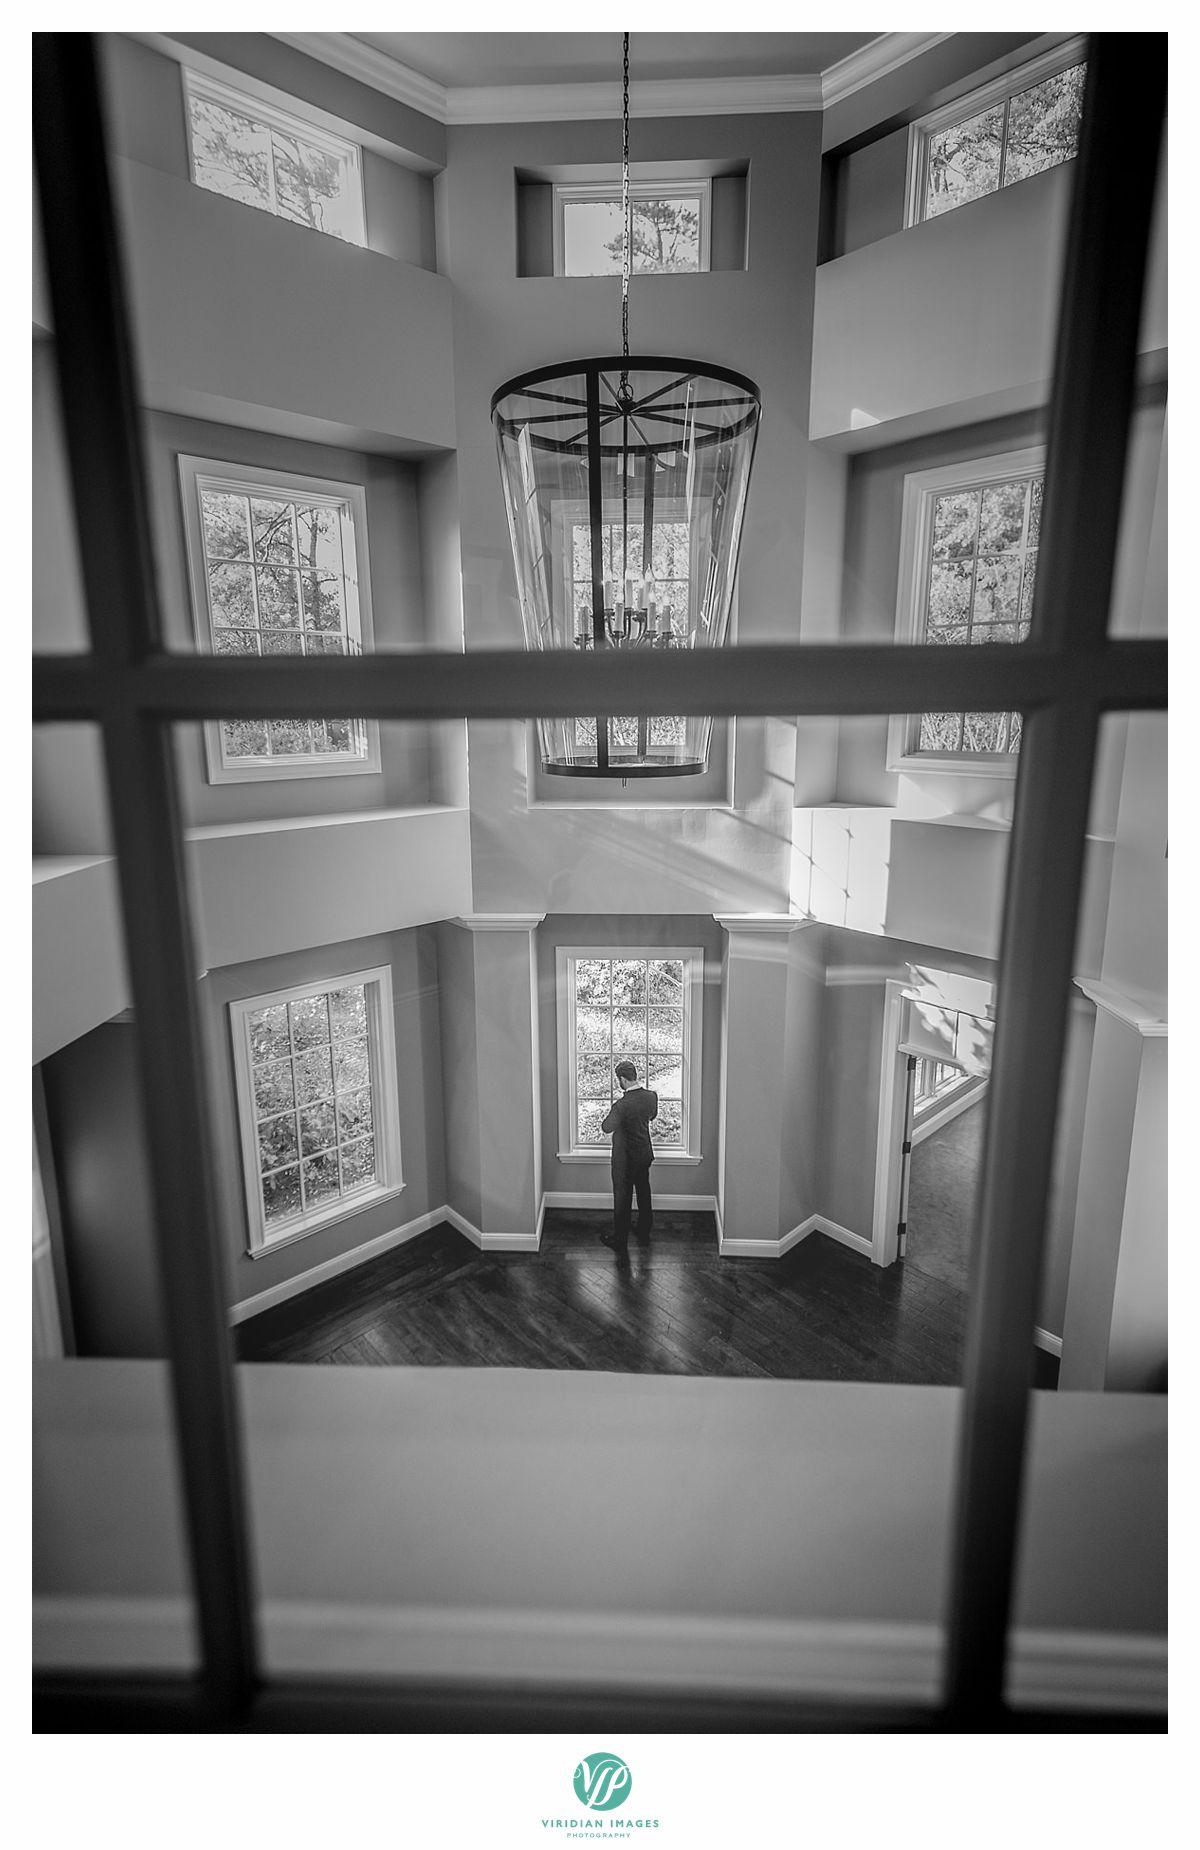 Creative groom portrait through window pane